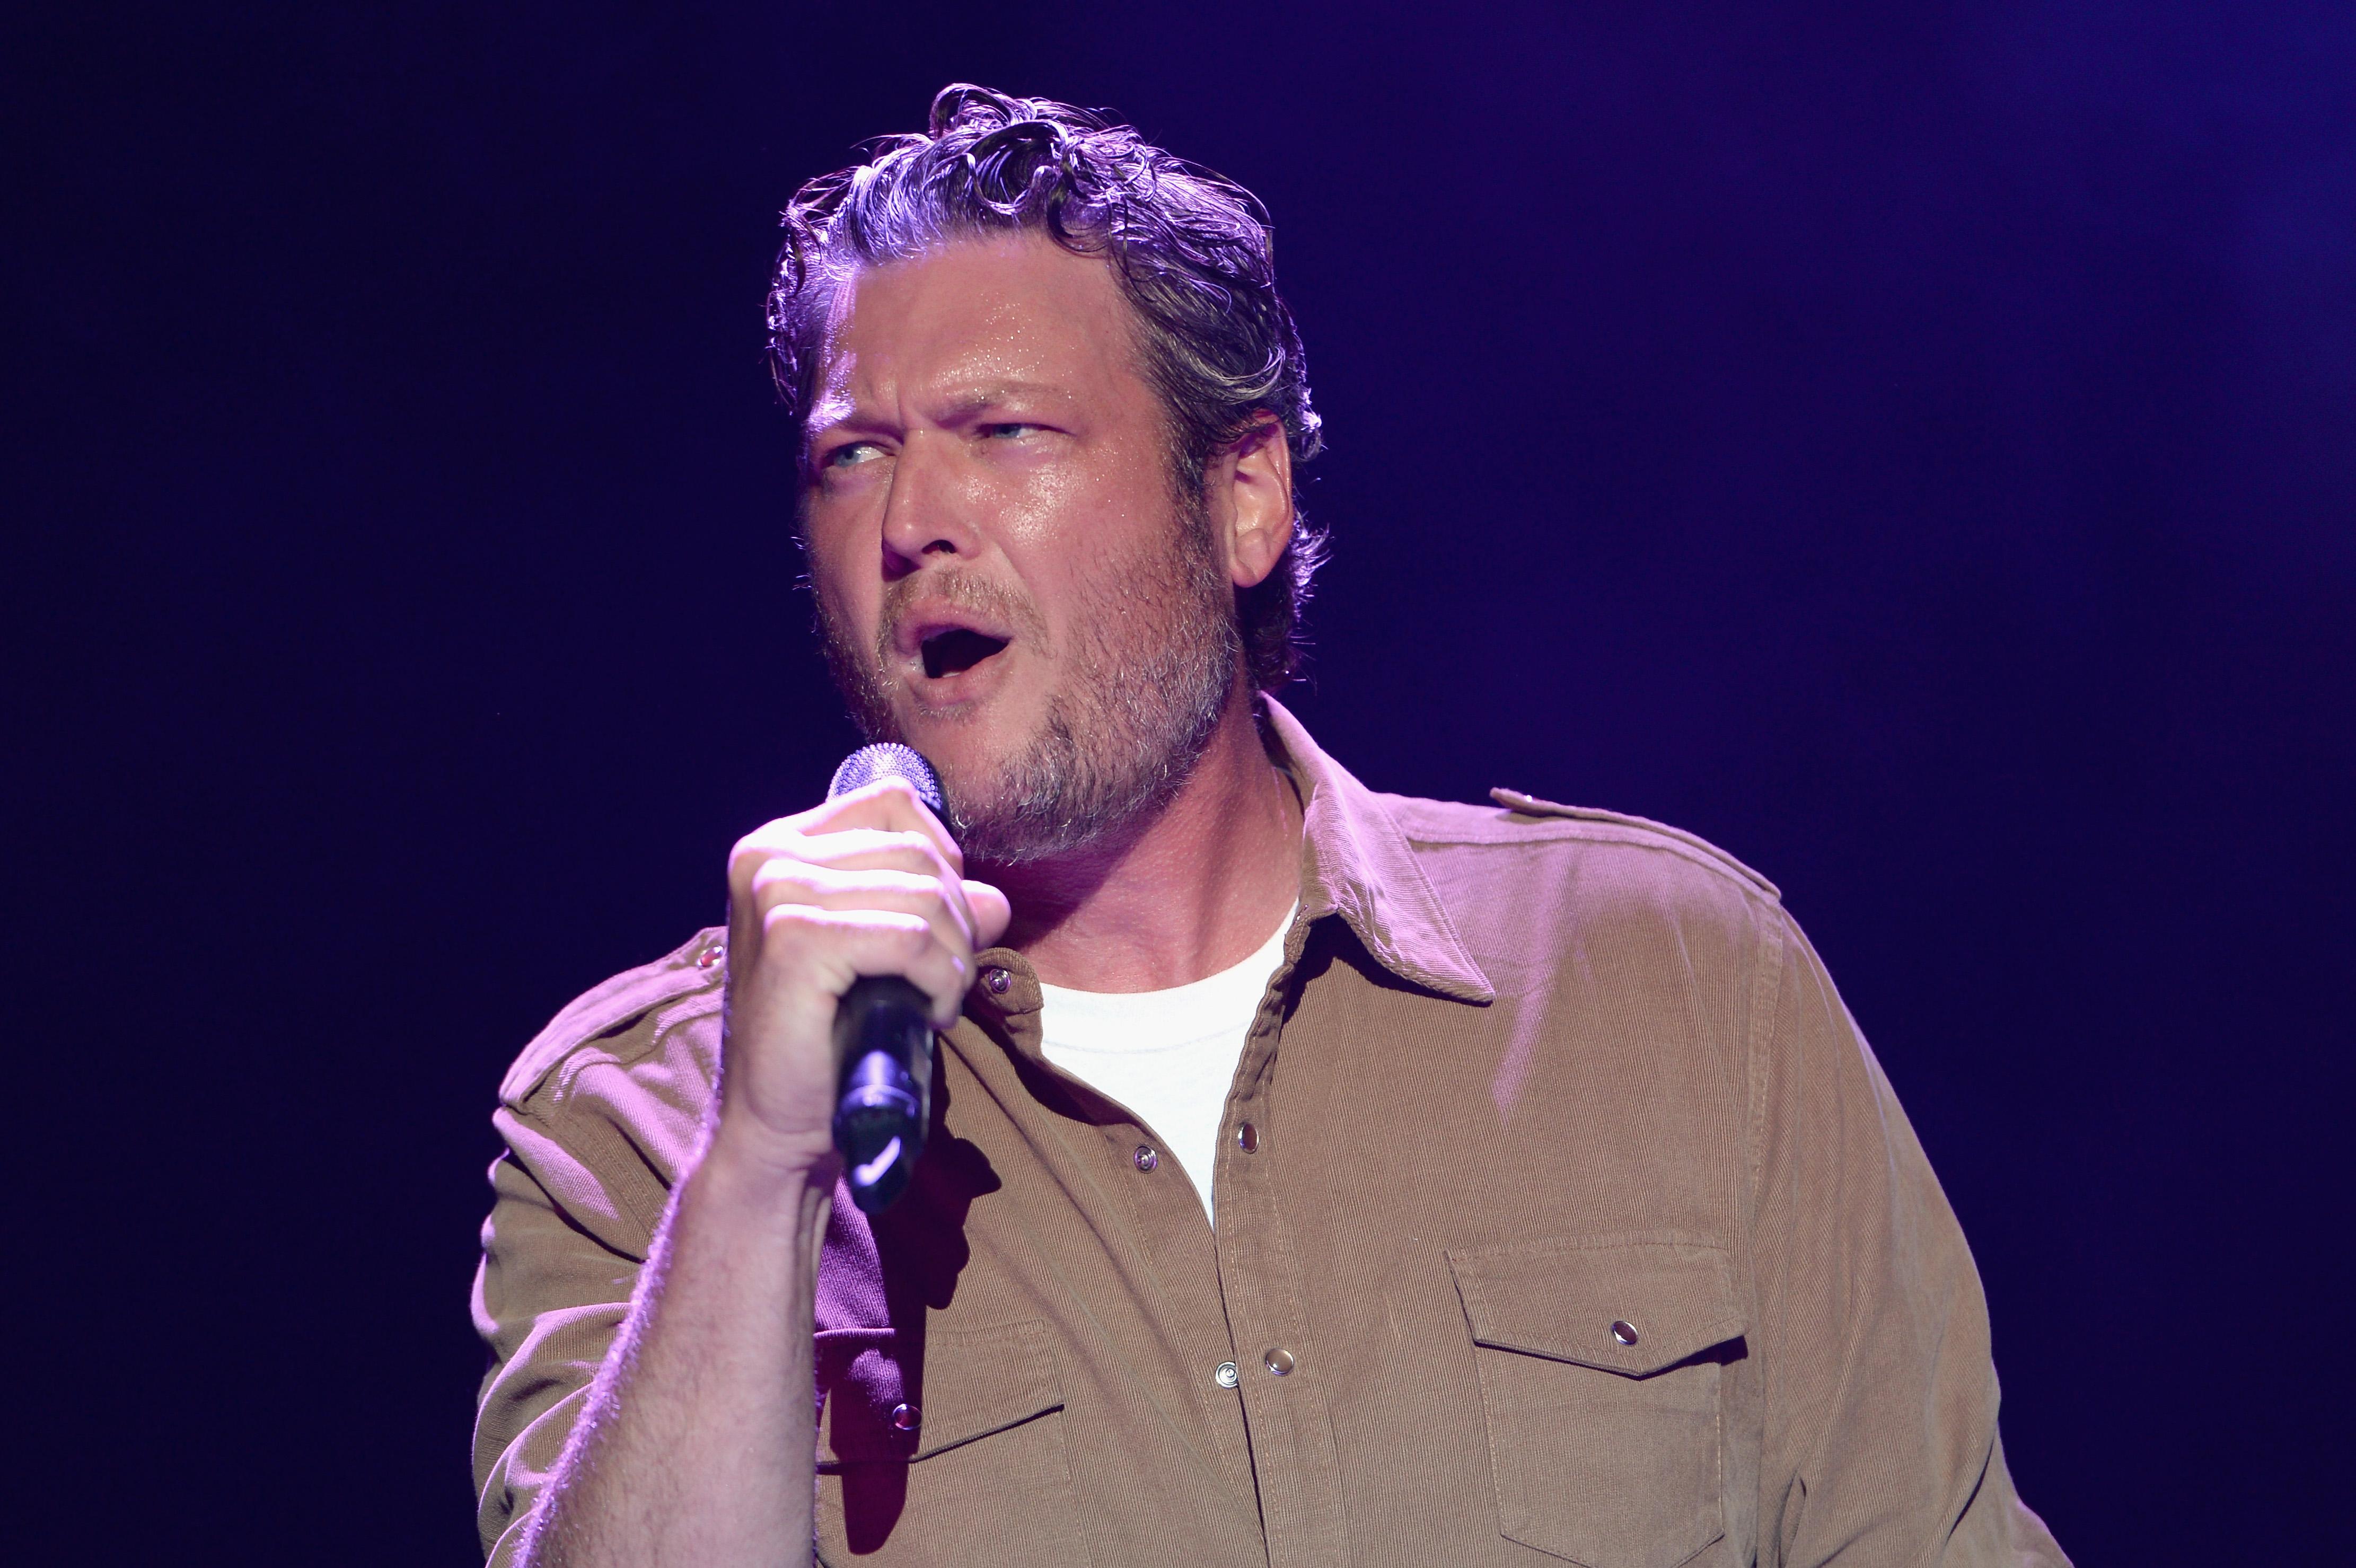 Blake Shelton Celebrates 20 Chart-Toppers With Greatest Hits Album